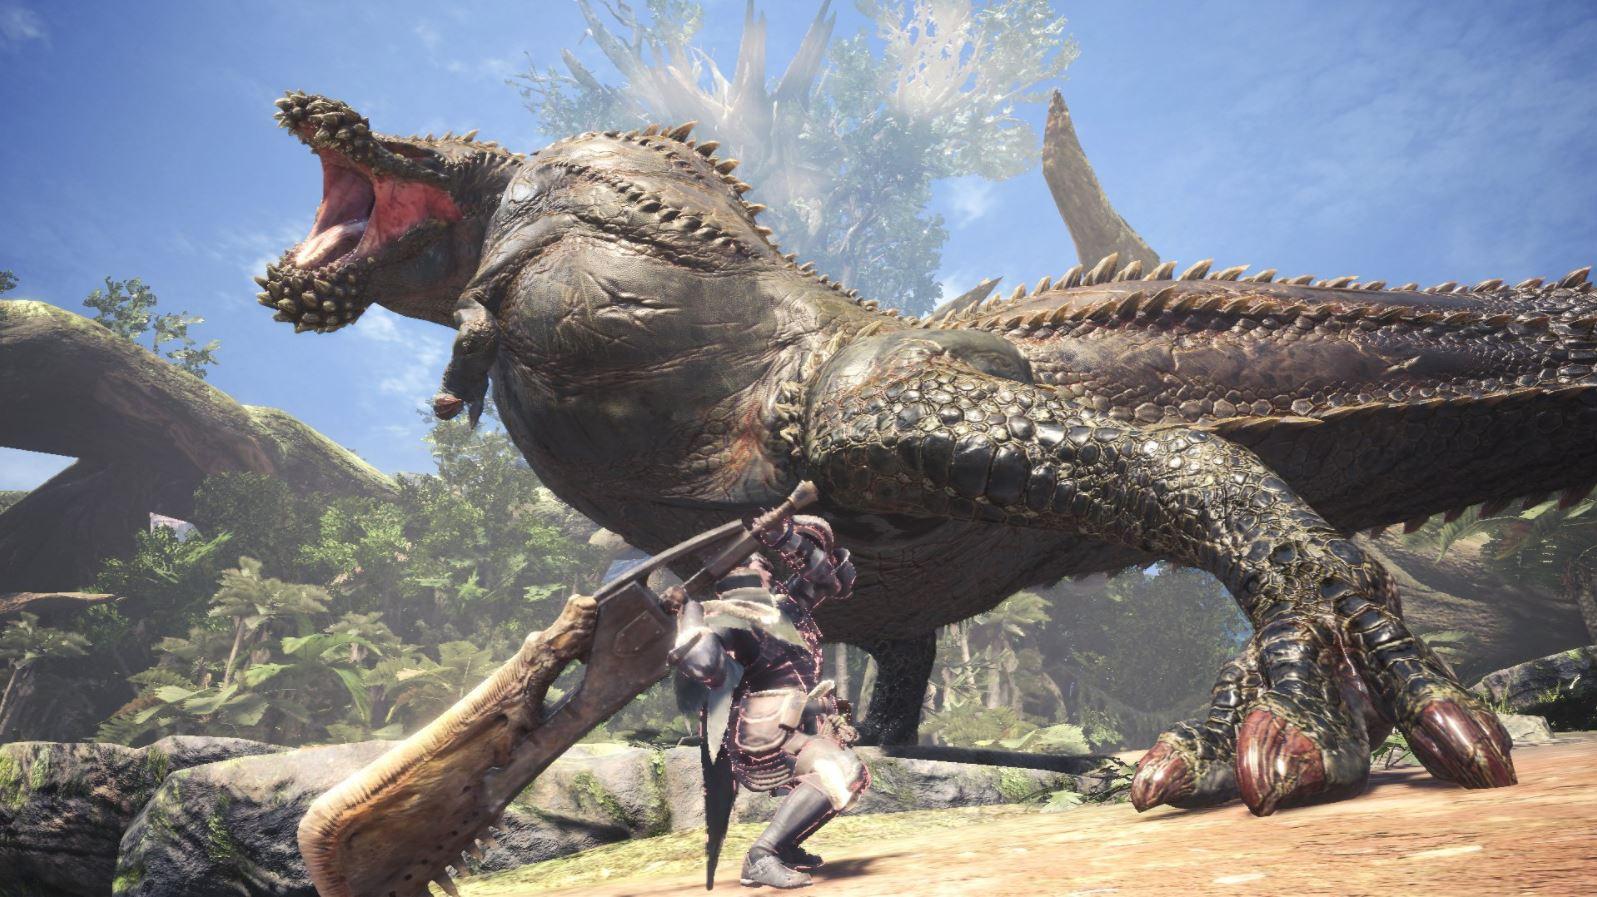 Neues Monster Deviljho kommt noch im März zu Monster Hunter World